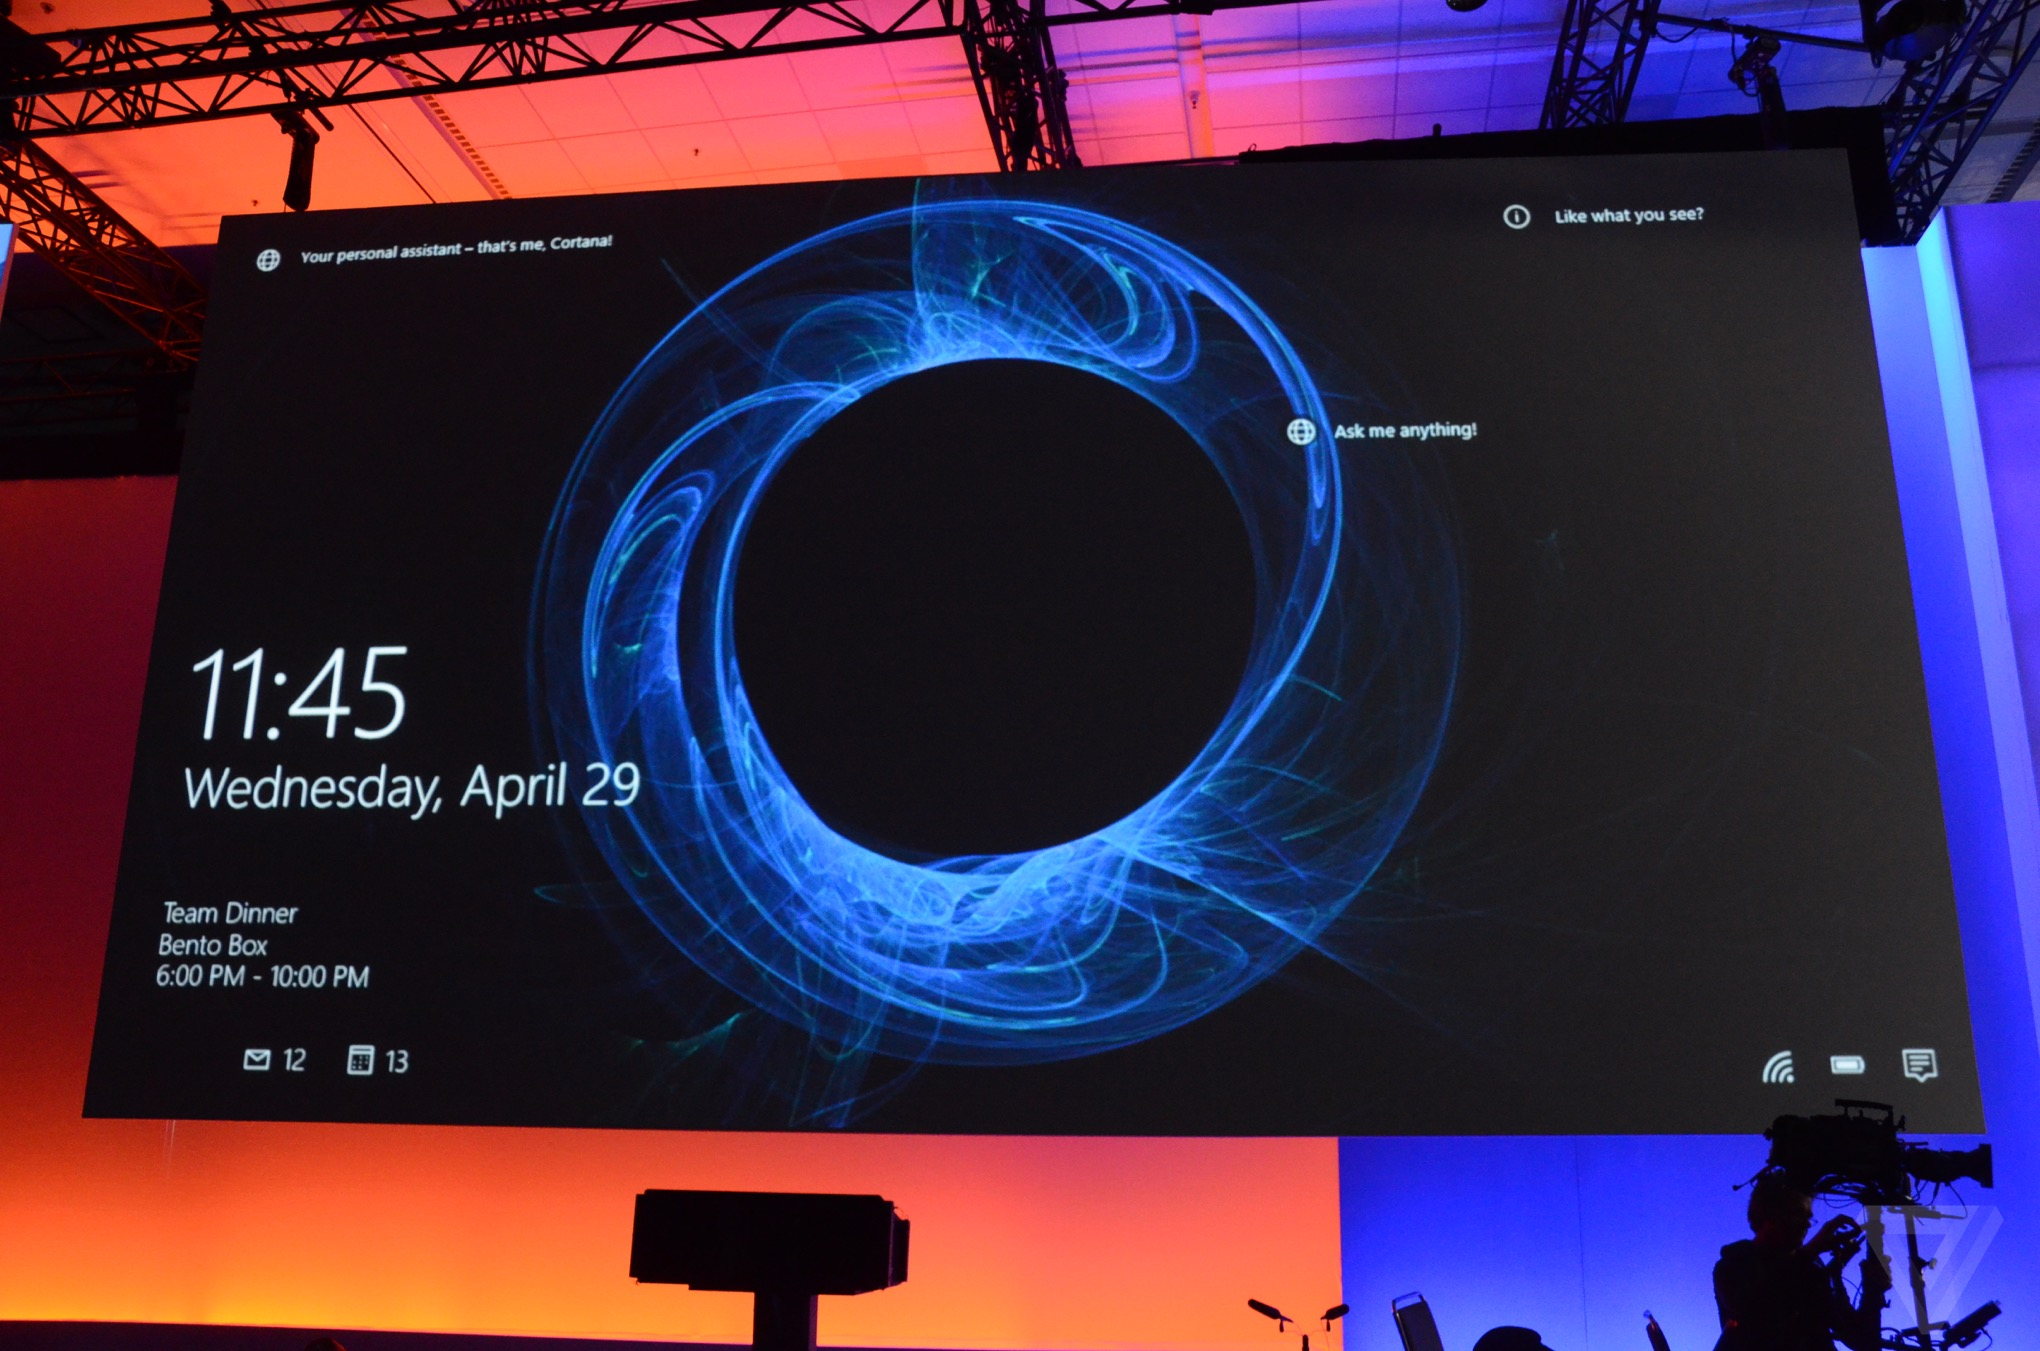 Microsoft Wants To Put Ads On The Windows 10 Lock Screen